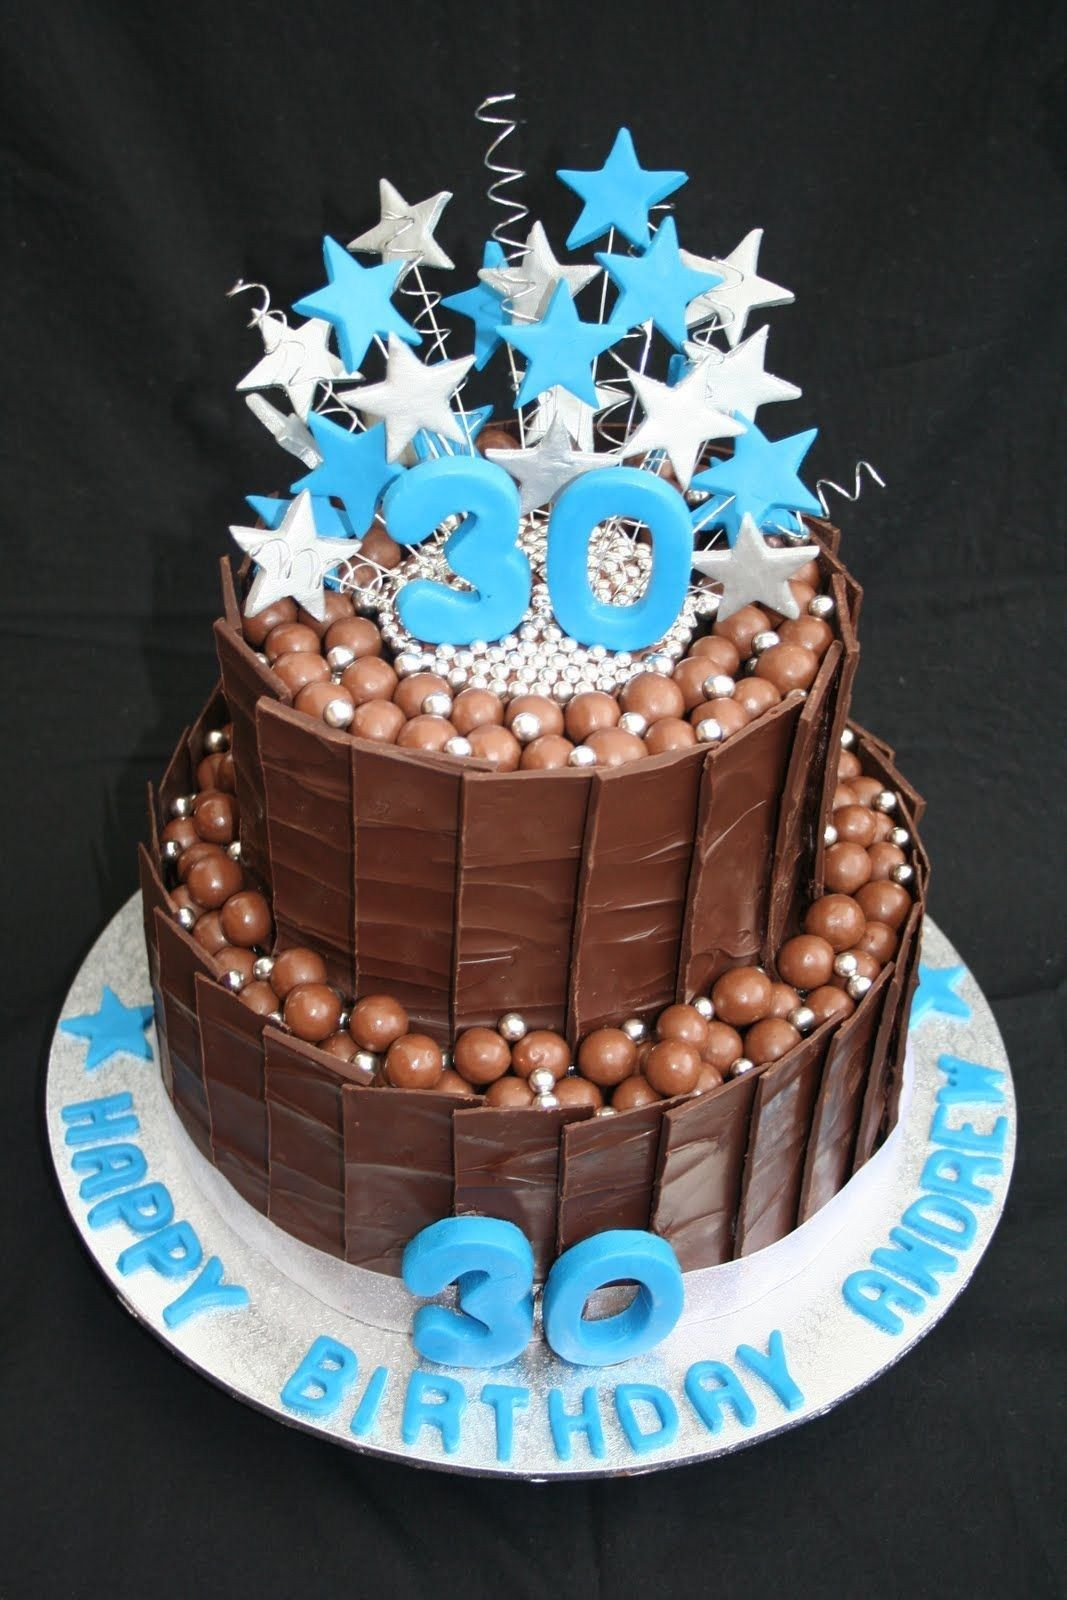 30th birthday cake for boyfriend